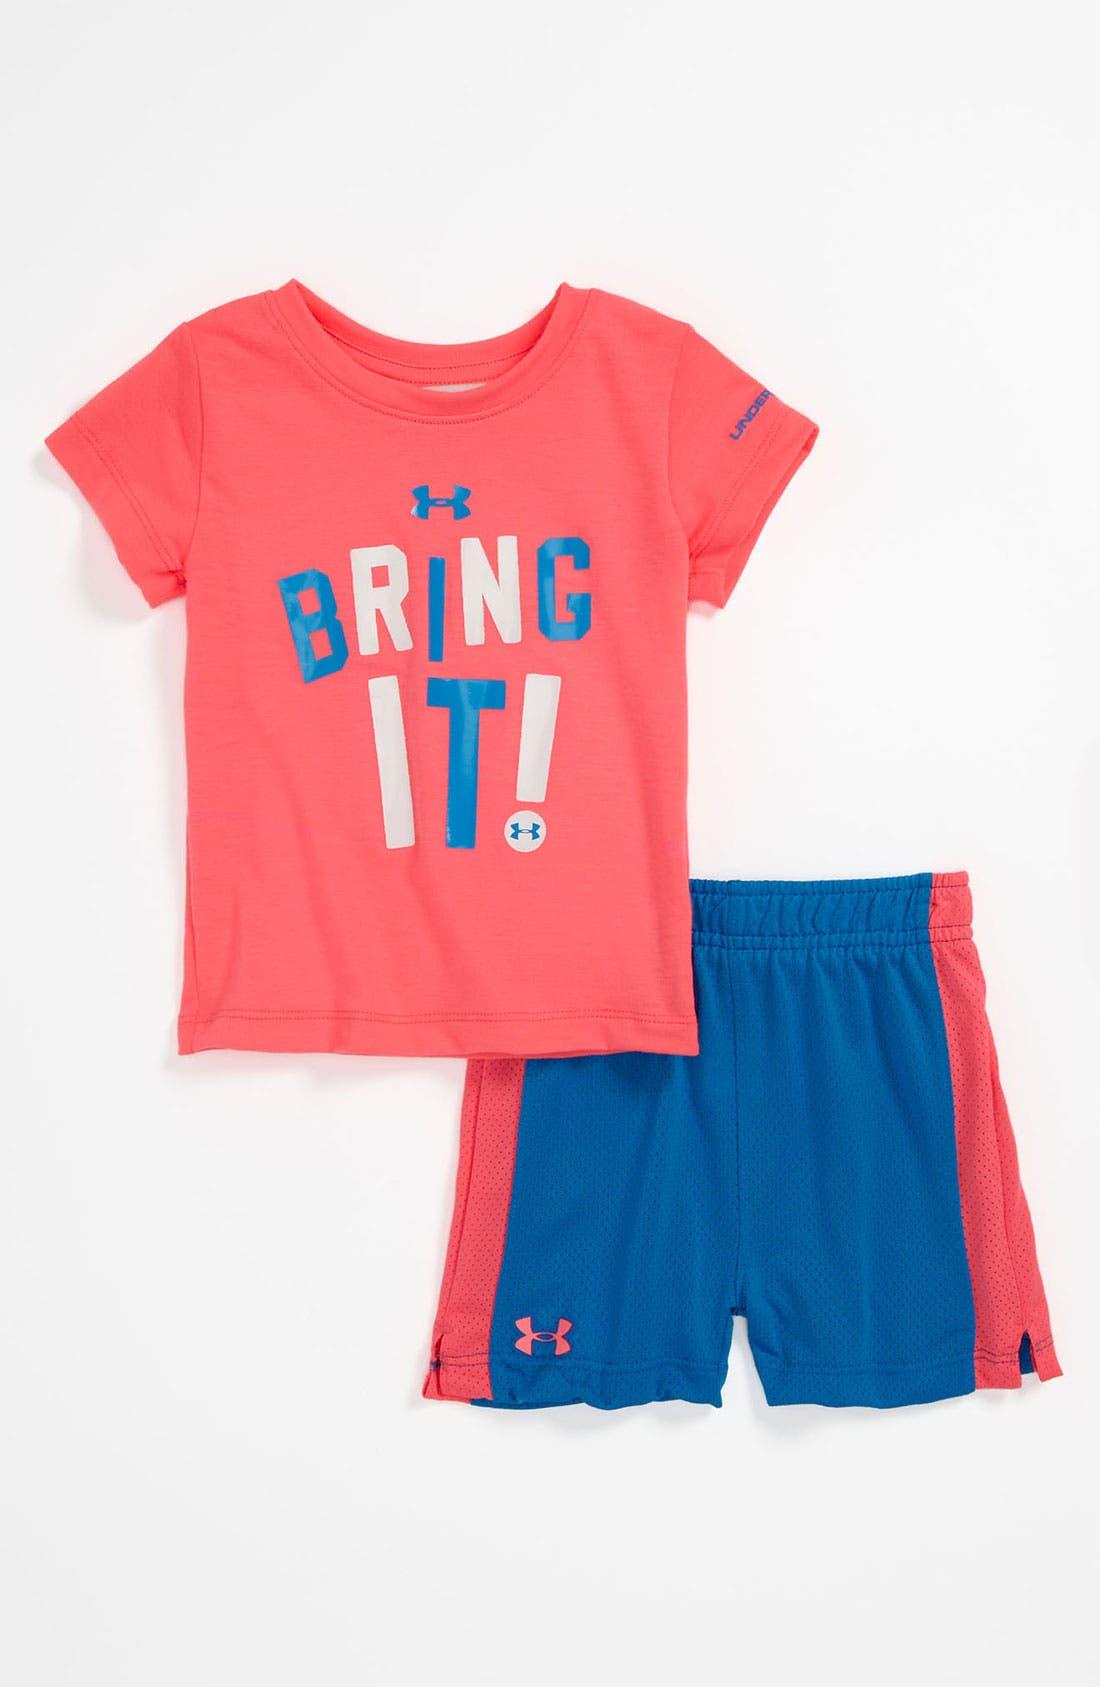 Main Image - Under Armour T-Shirt & Shorts (Infant)